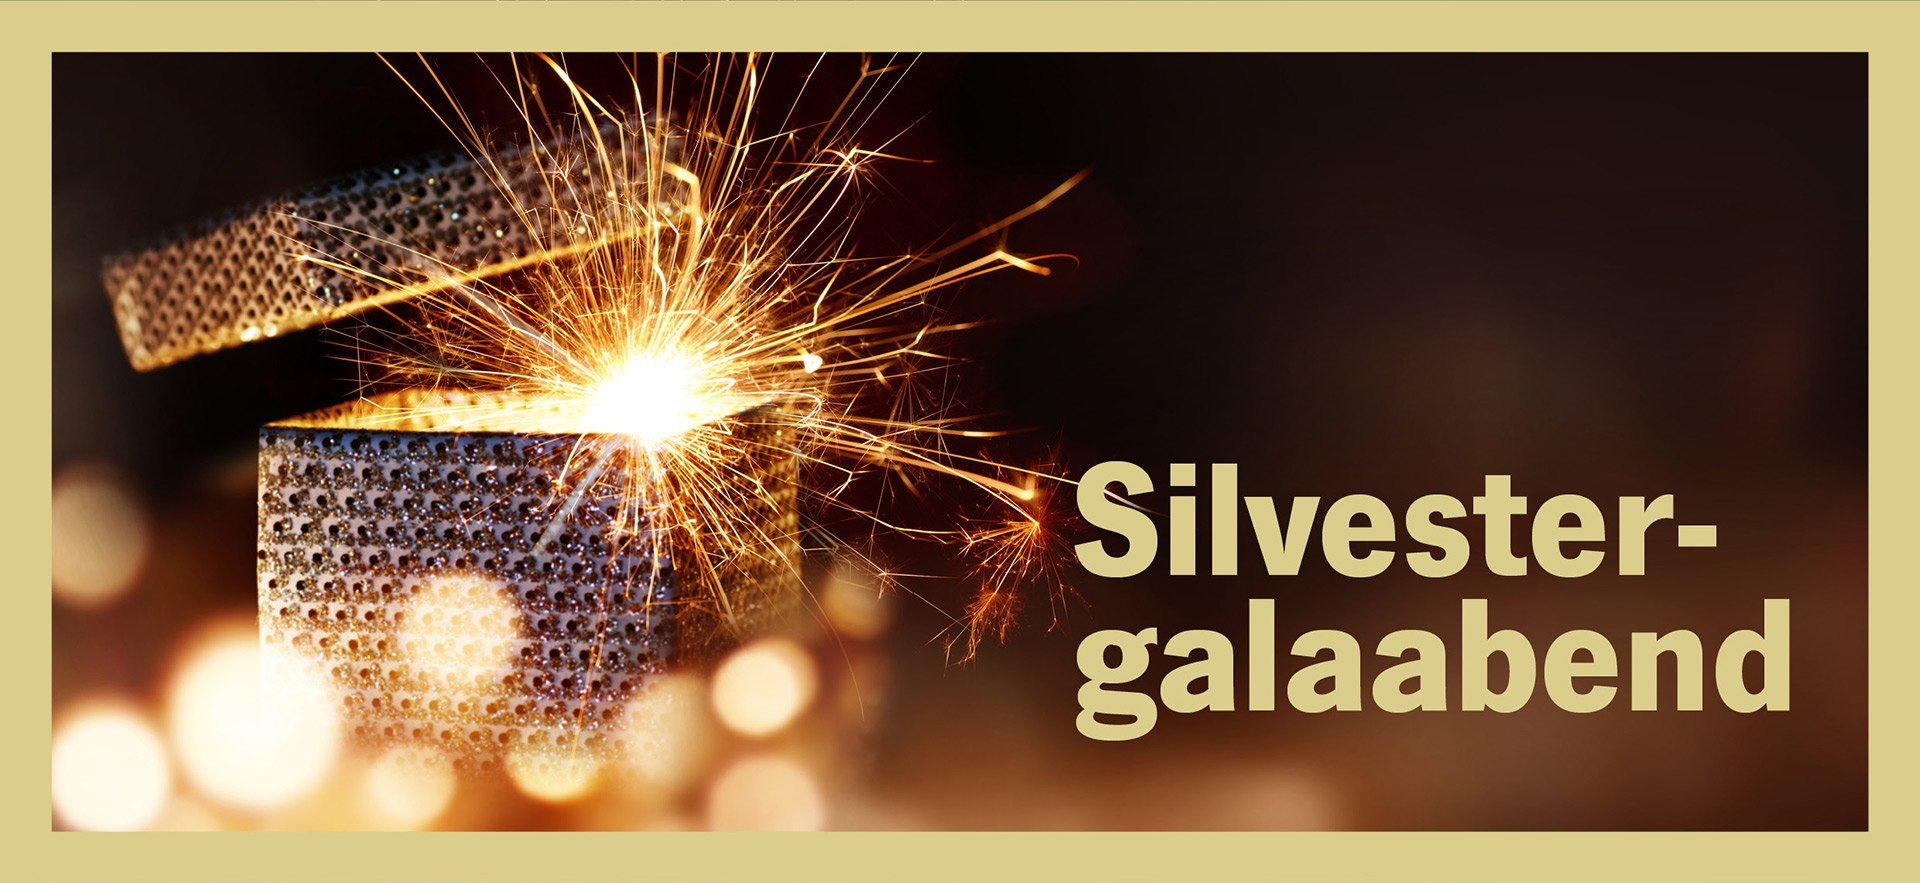 Silvester Gala-Abend 2019